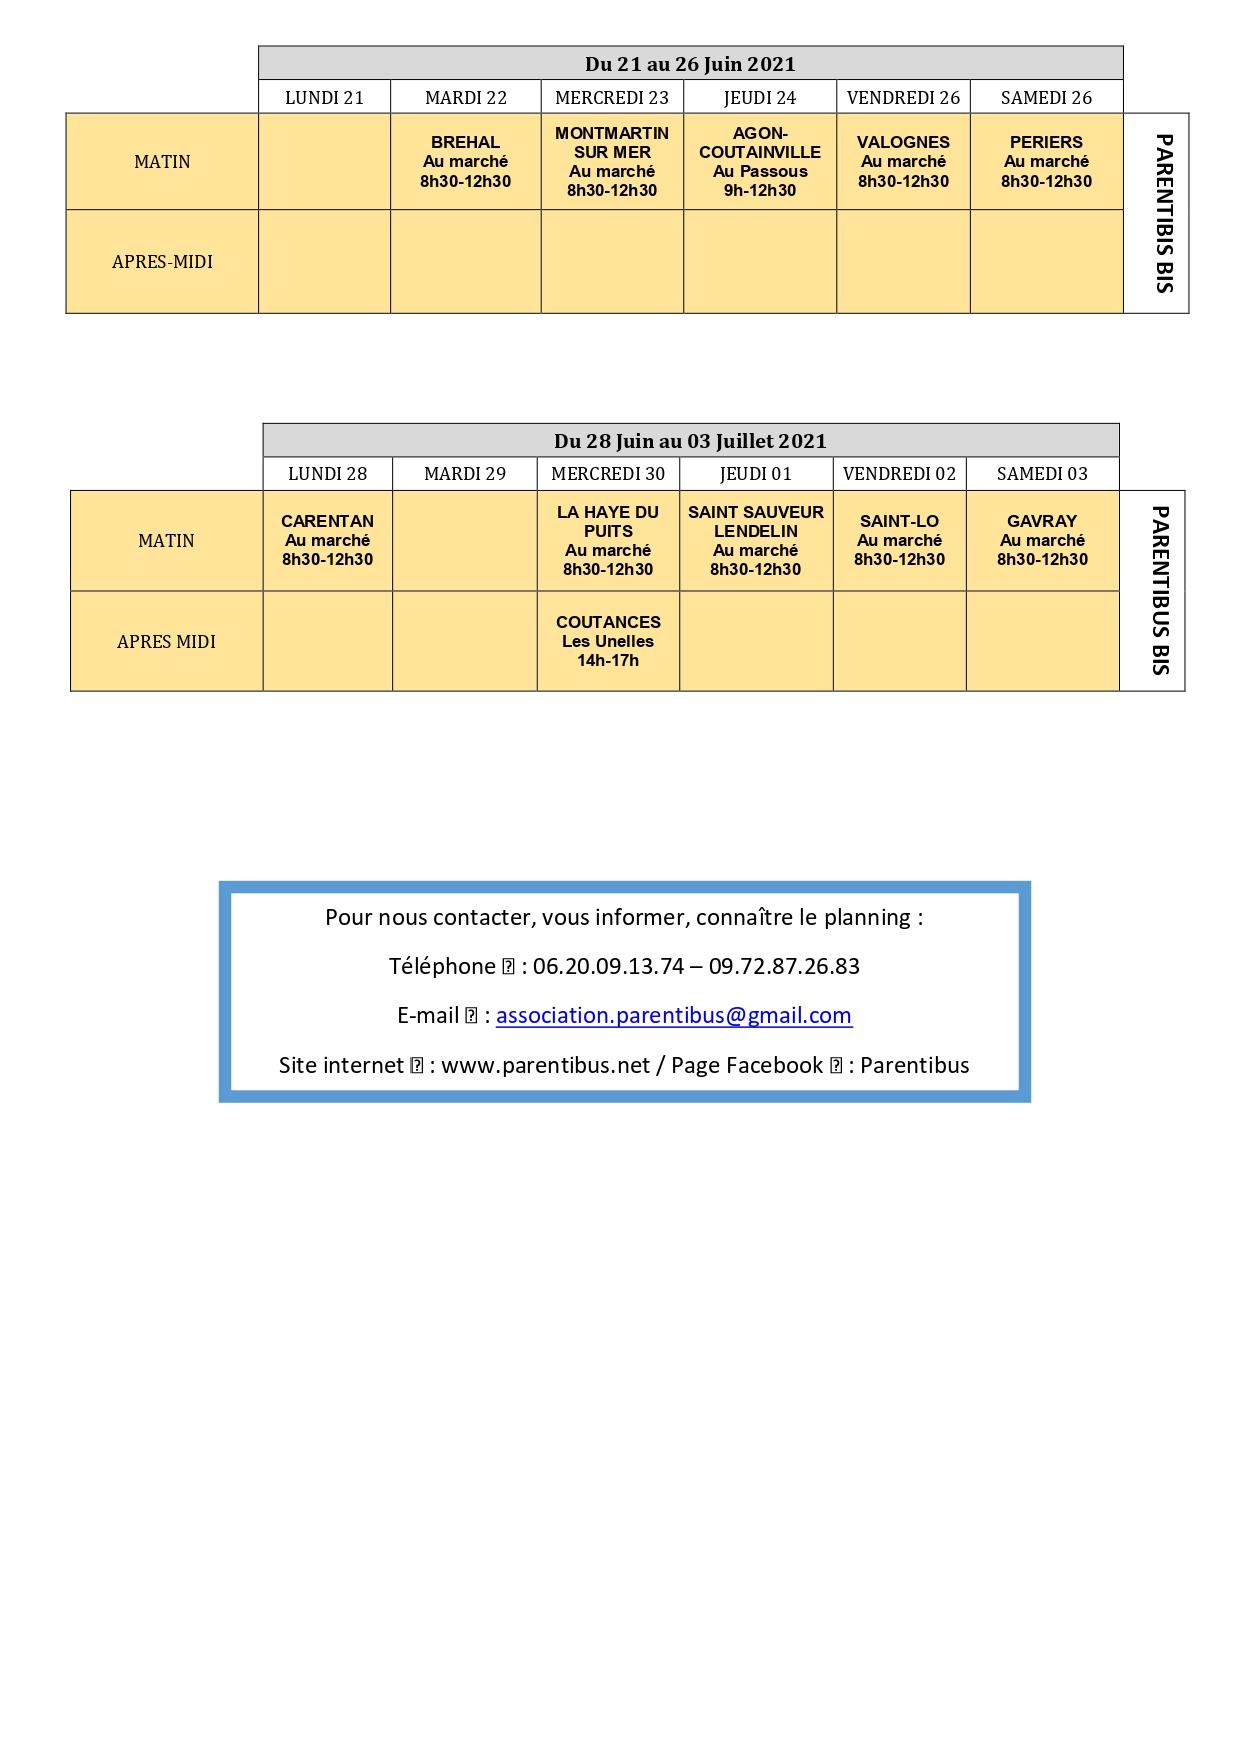 Planning_PARENTIBUS_Mai_Juin_Juillet_2021_page-0002.jpg